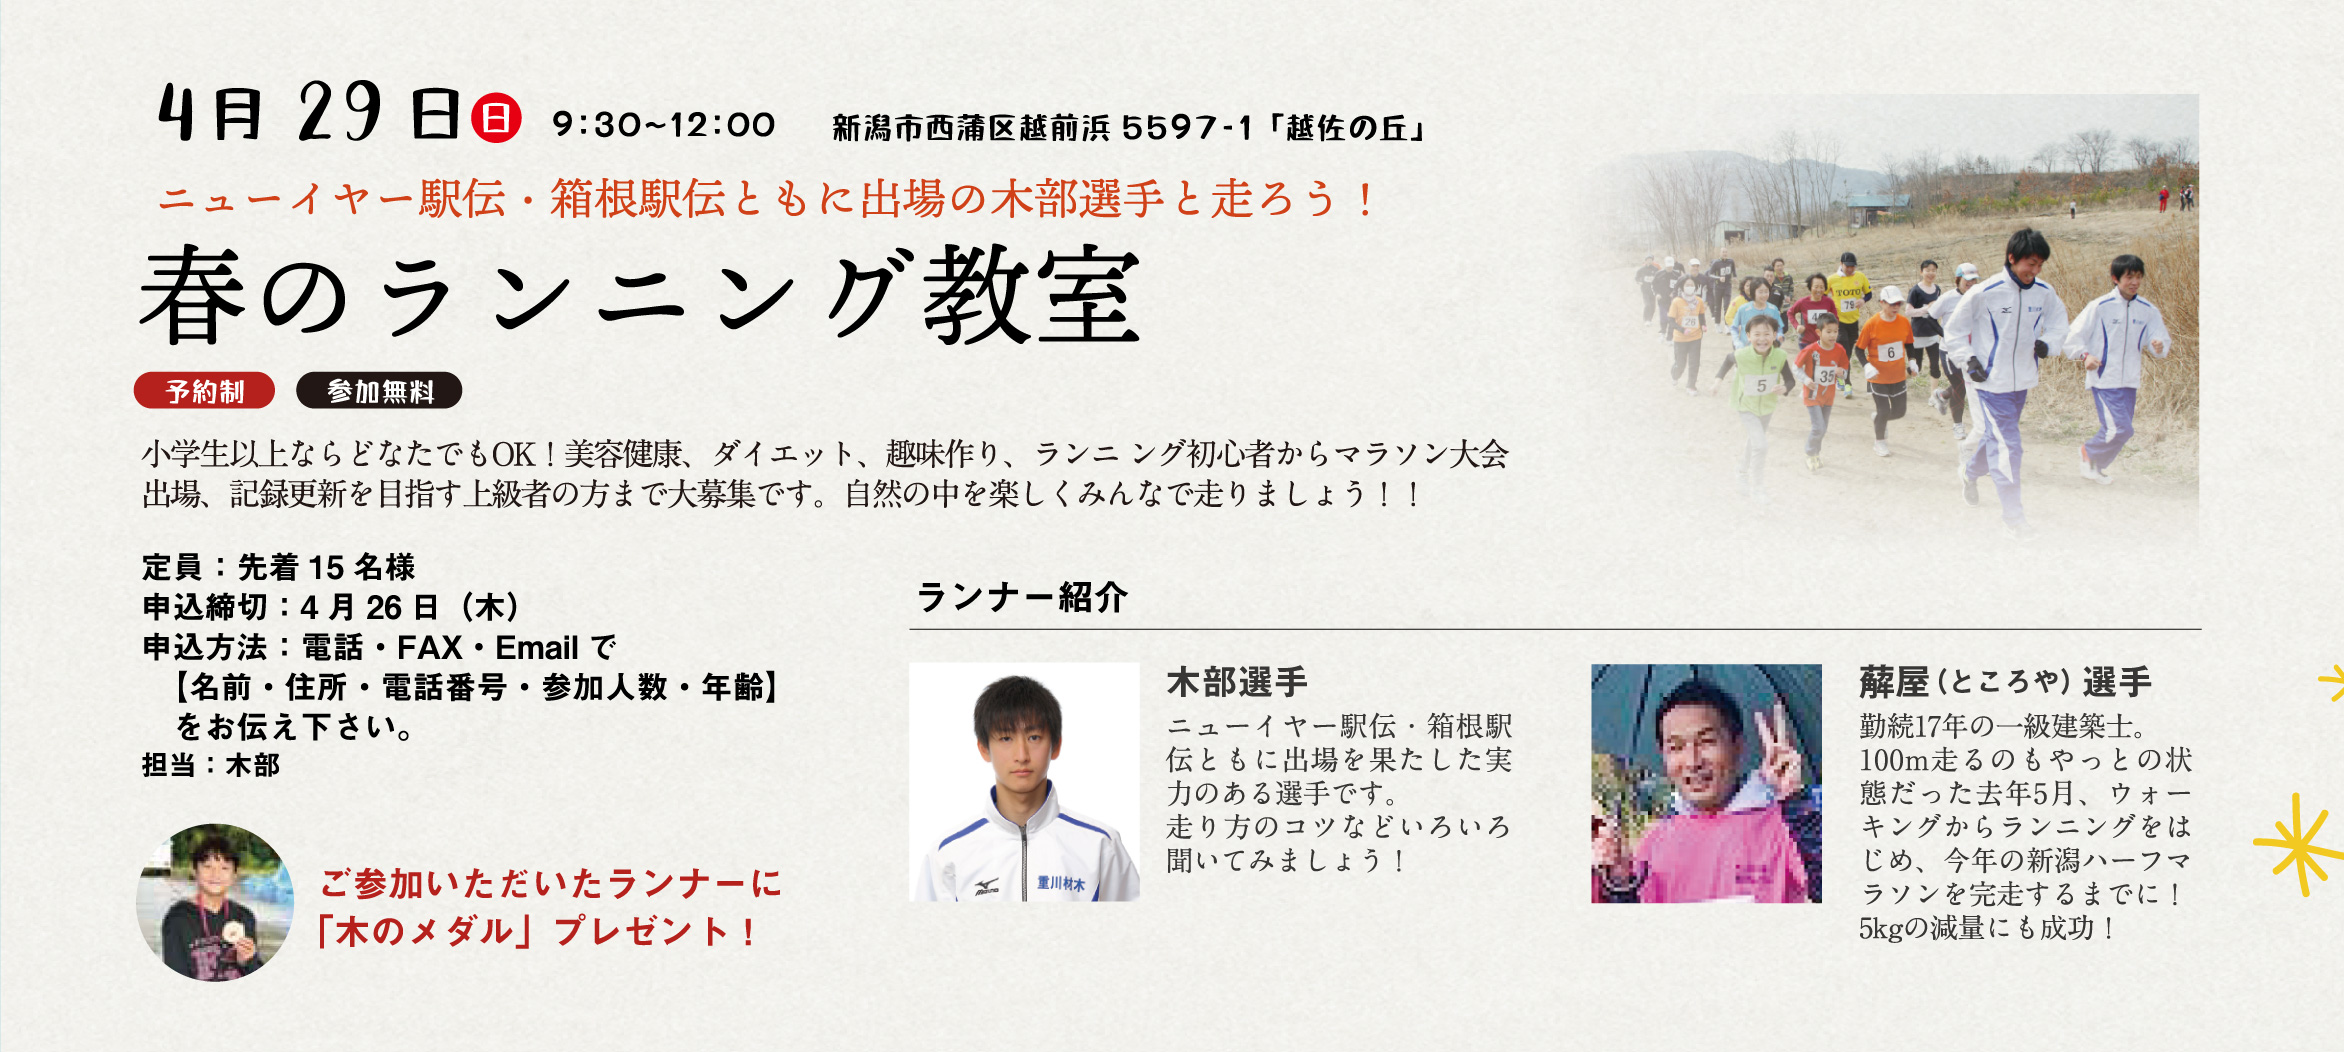 event-running